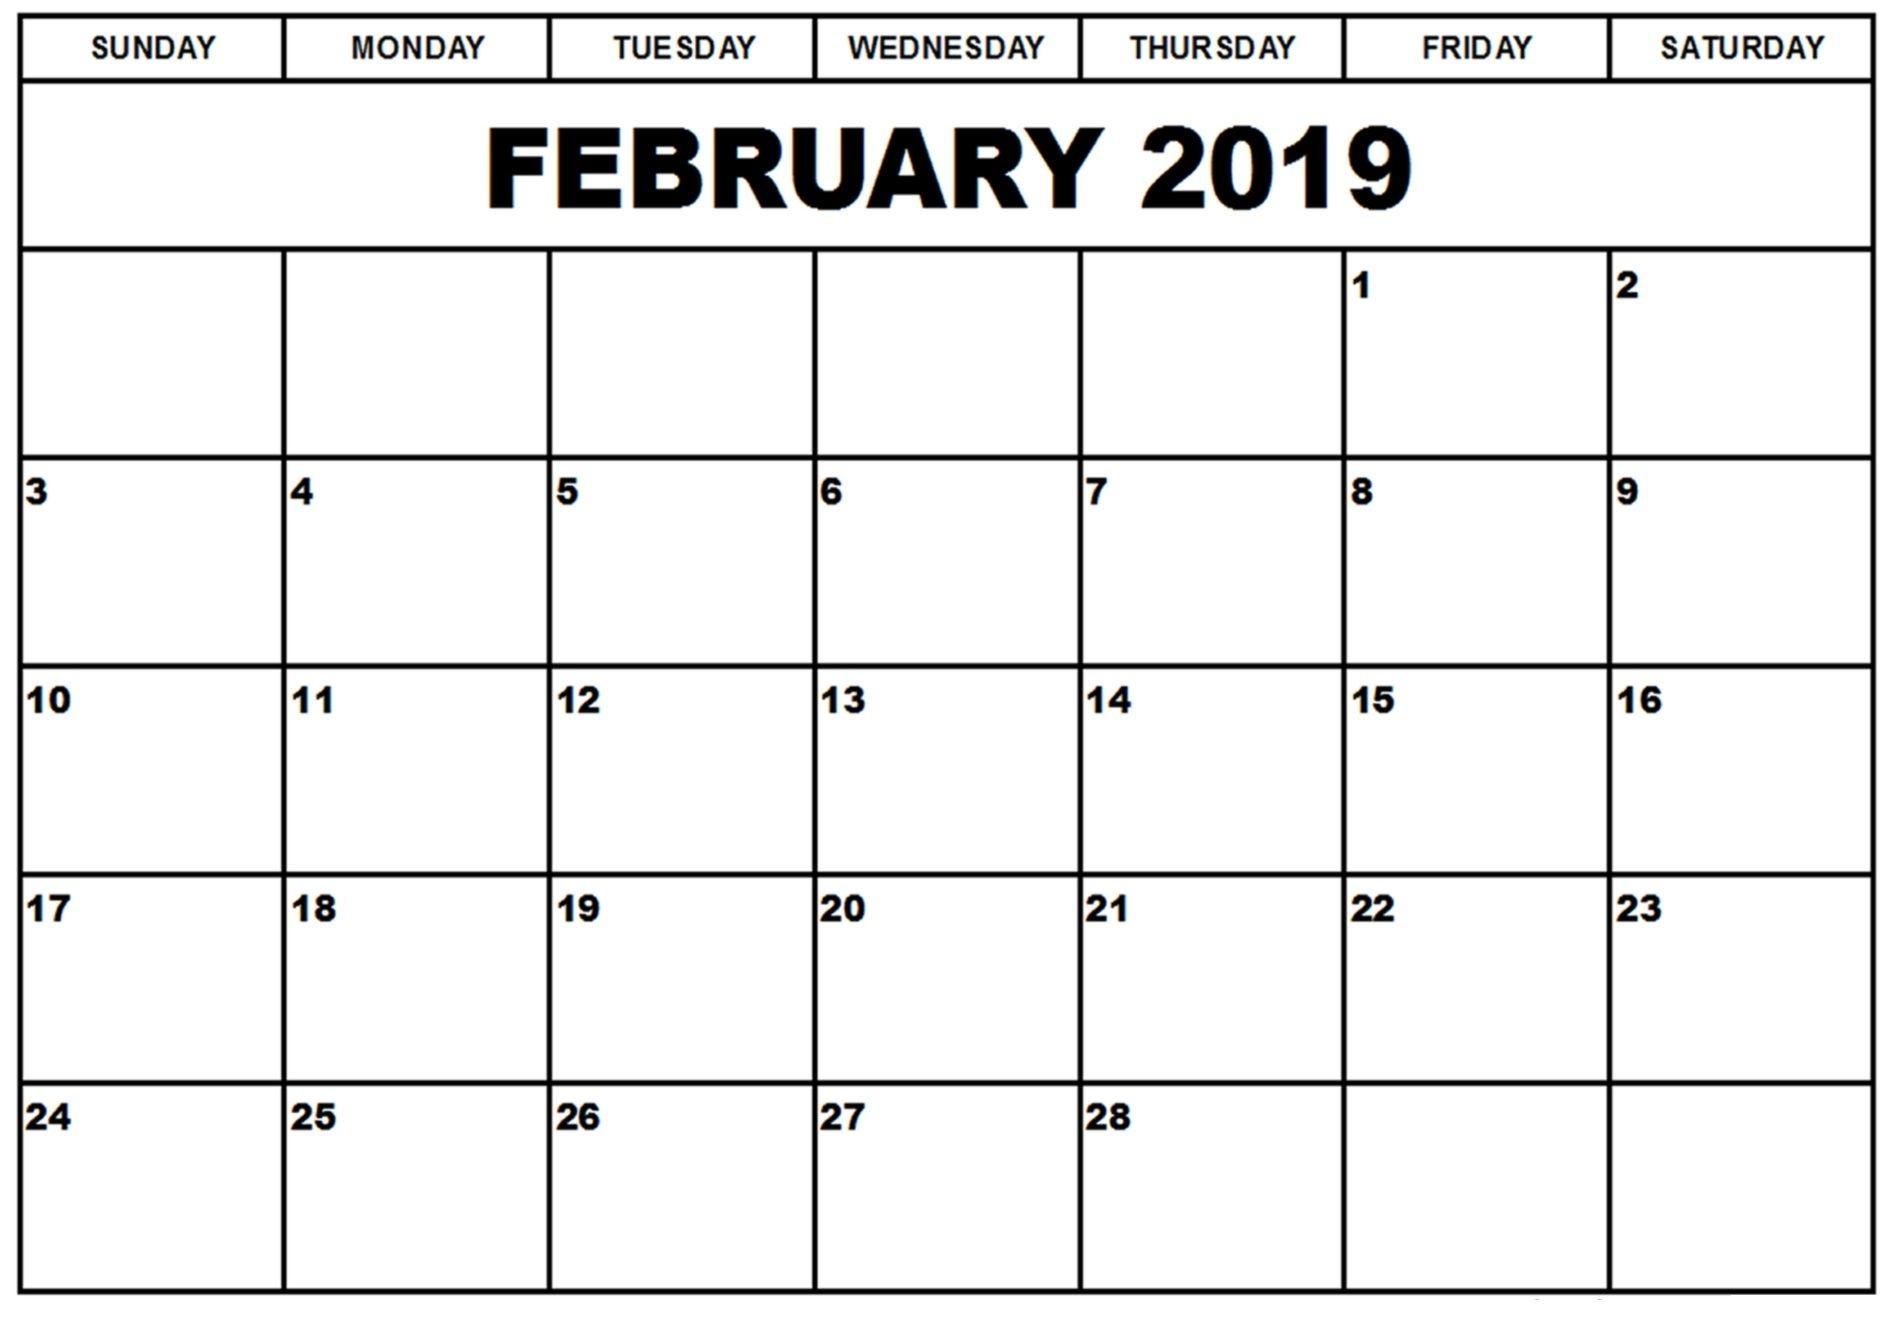 February 2019 Calendar Customized Free Printable February 2019